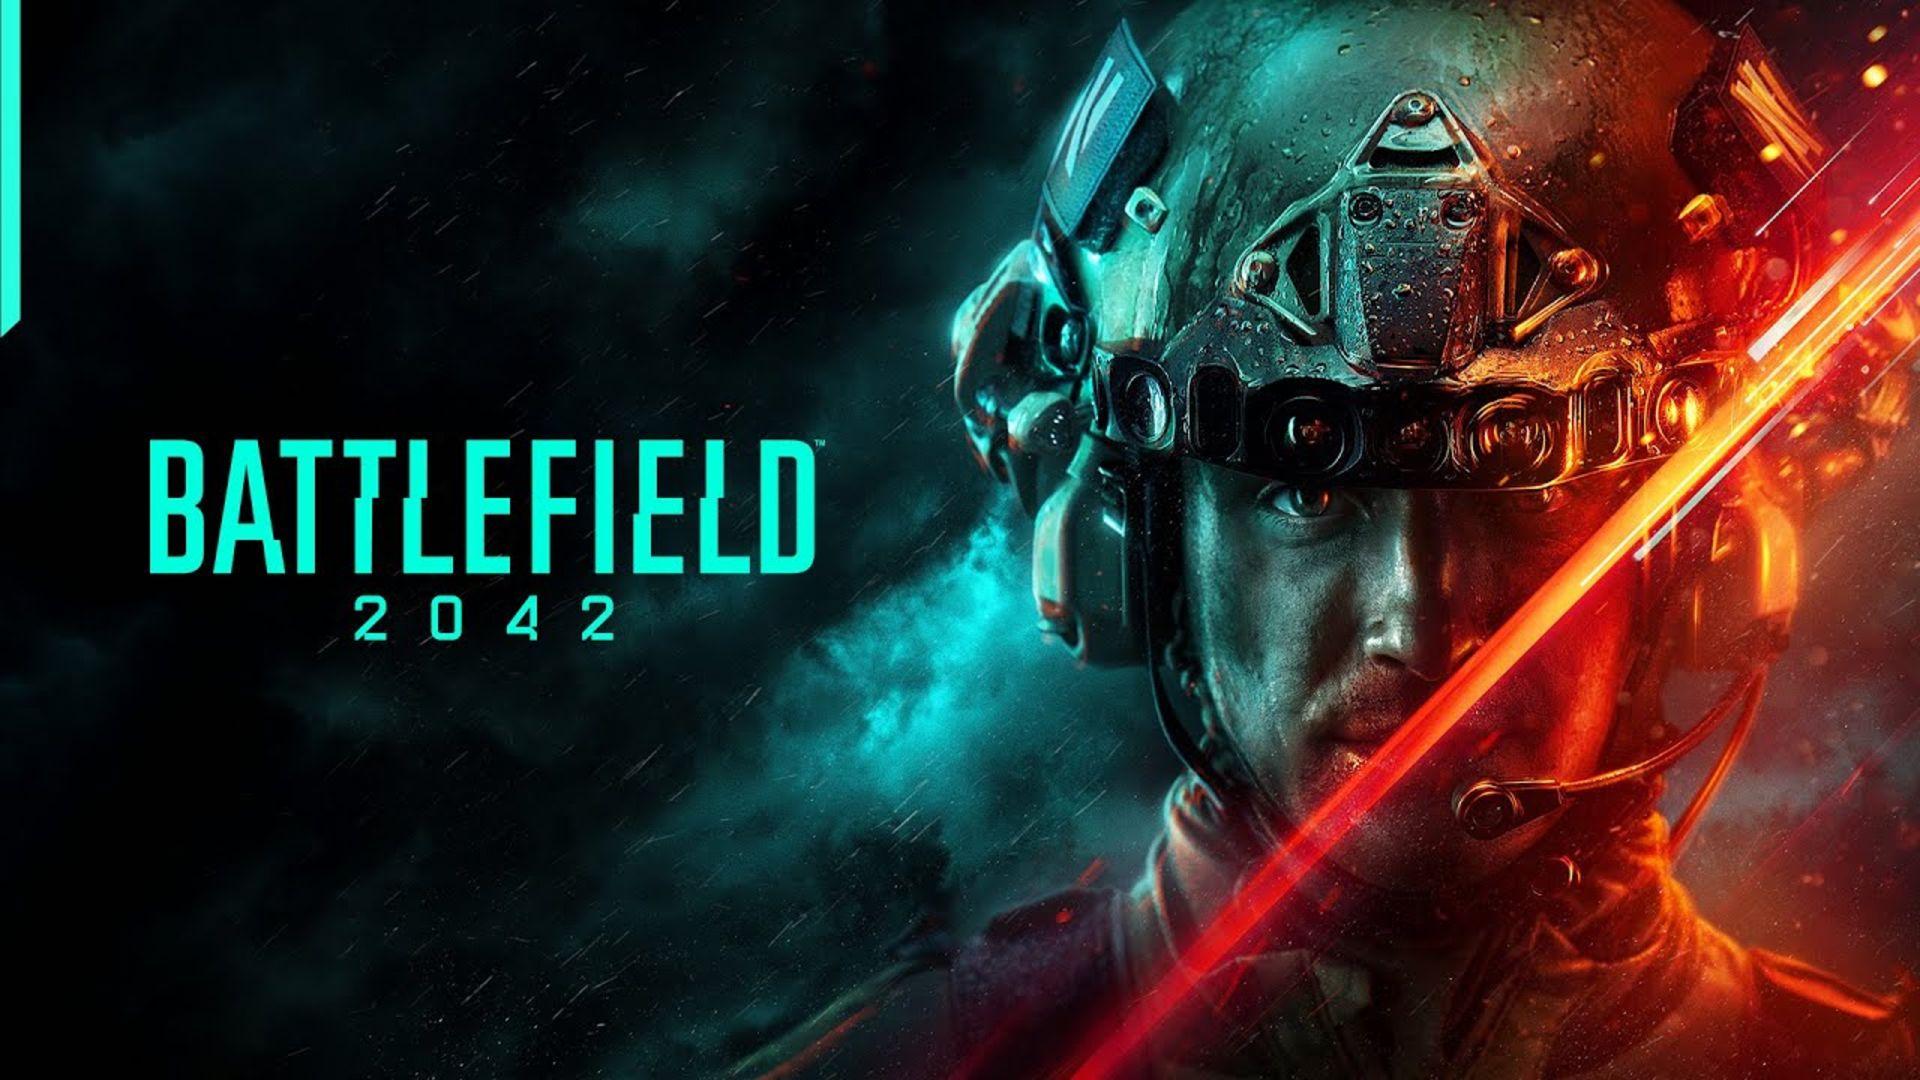 Battlefield 2042 Wallpapers   Top 35 Best Battlefield 2042 1920x1080